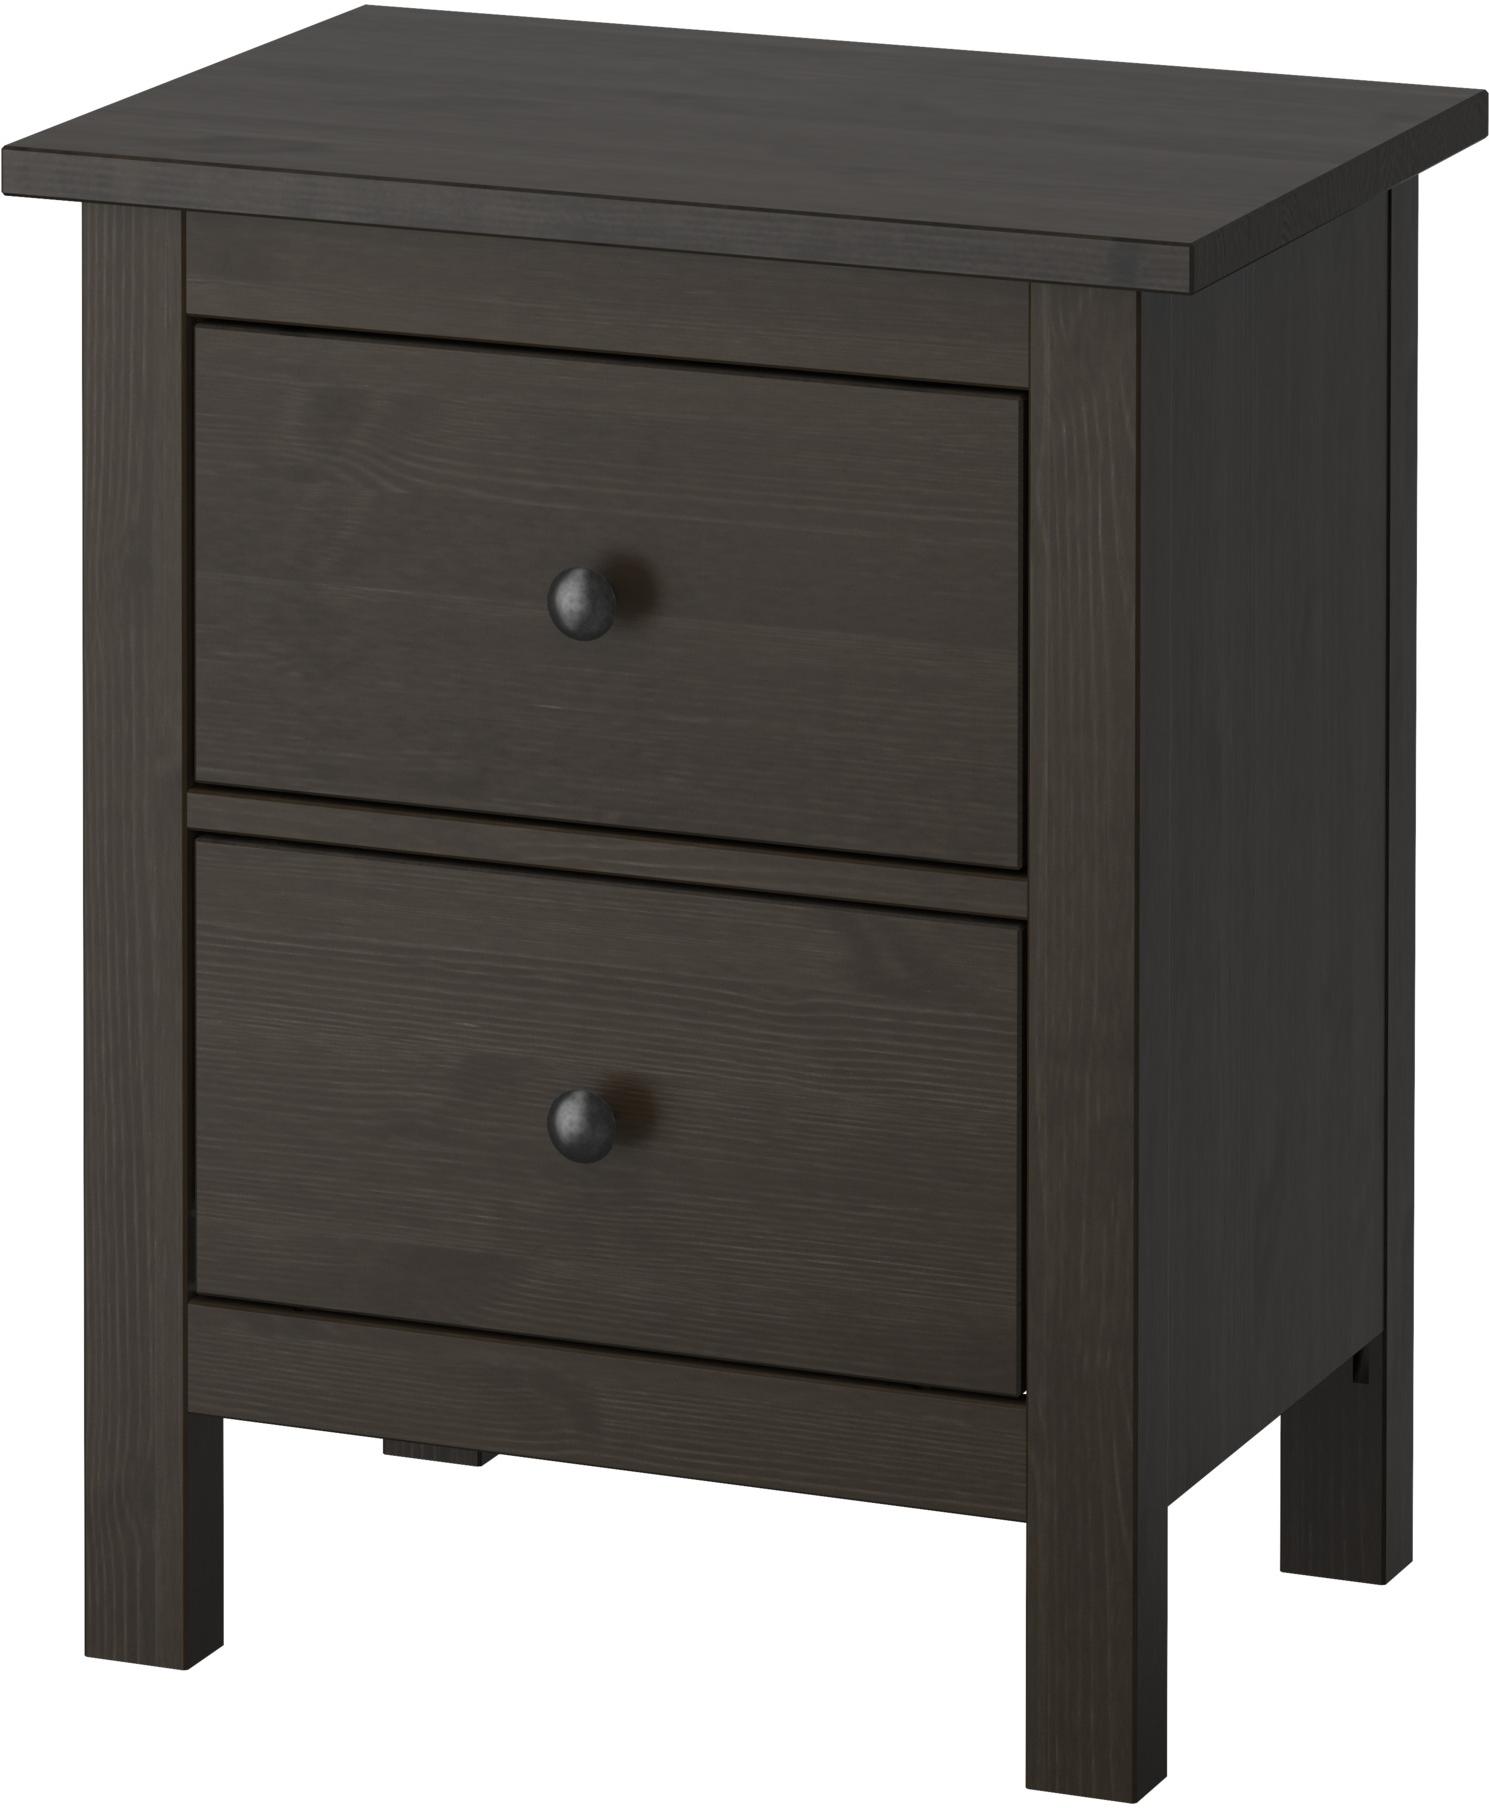 HEMNES 2-drawer chest - black-brown - IKEA